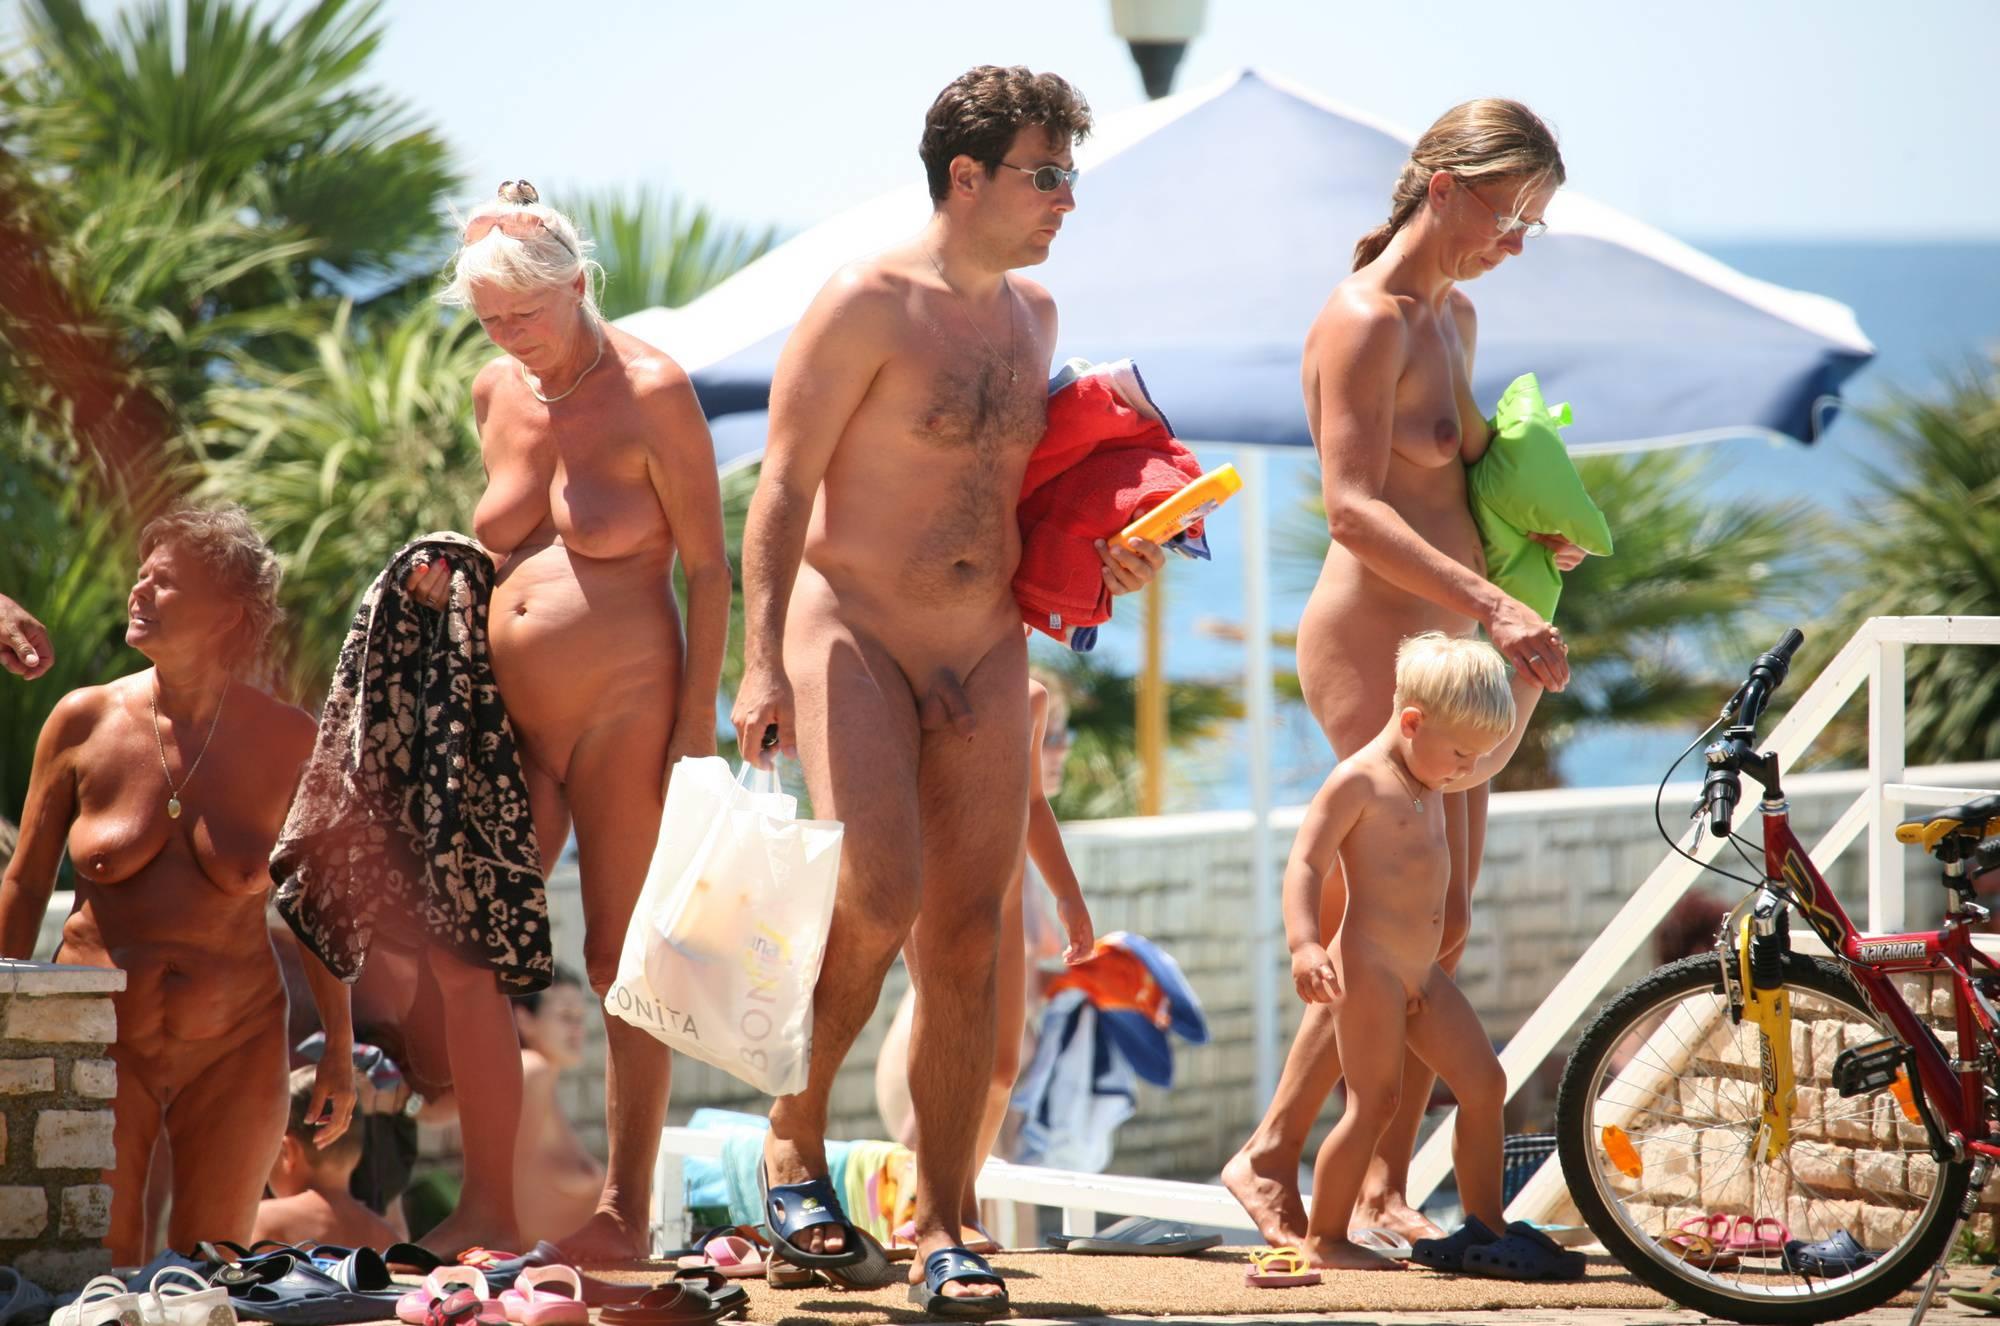 Nuda Pool Family Lifestyle - 4